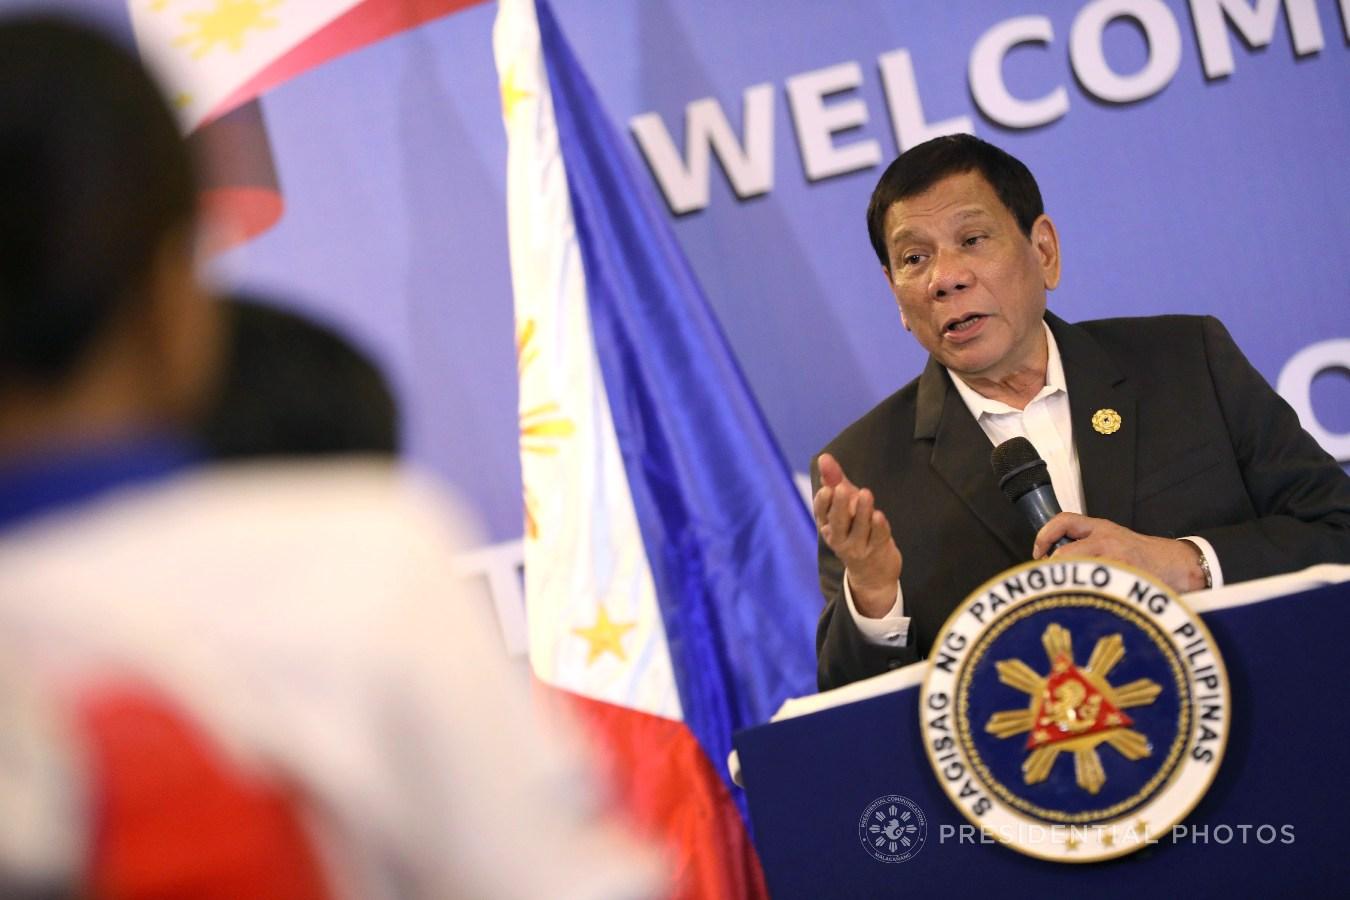 President Rodrigo Roa Duterte addresses the Filipinos residing in Vietnam during a meeting at the Pulchra Resort in Da Nang City, Vietnam on November 9, 2017. (KARL NORMAN ALONZO/PRESIDENTIAL PHOTO)